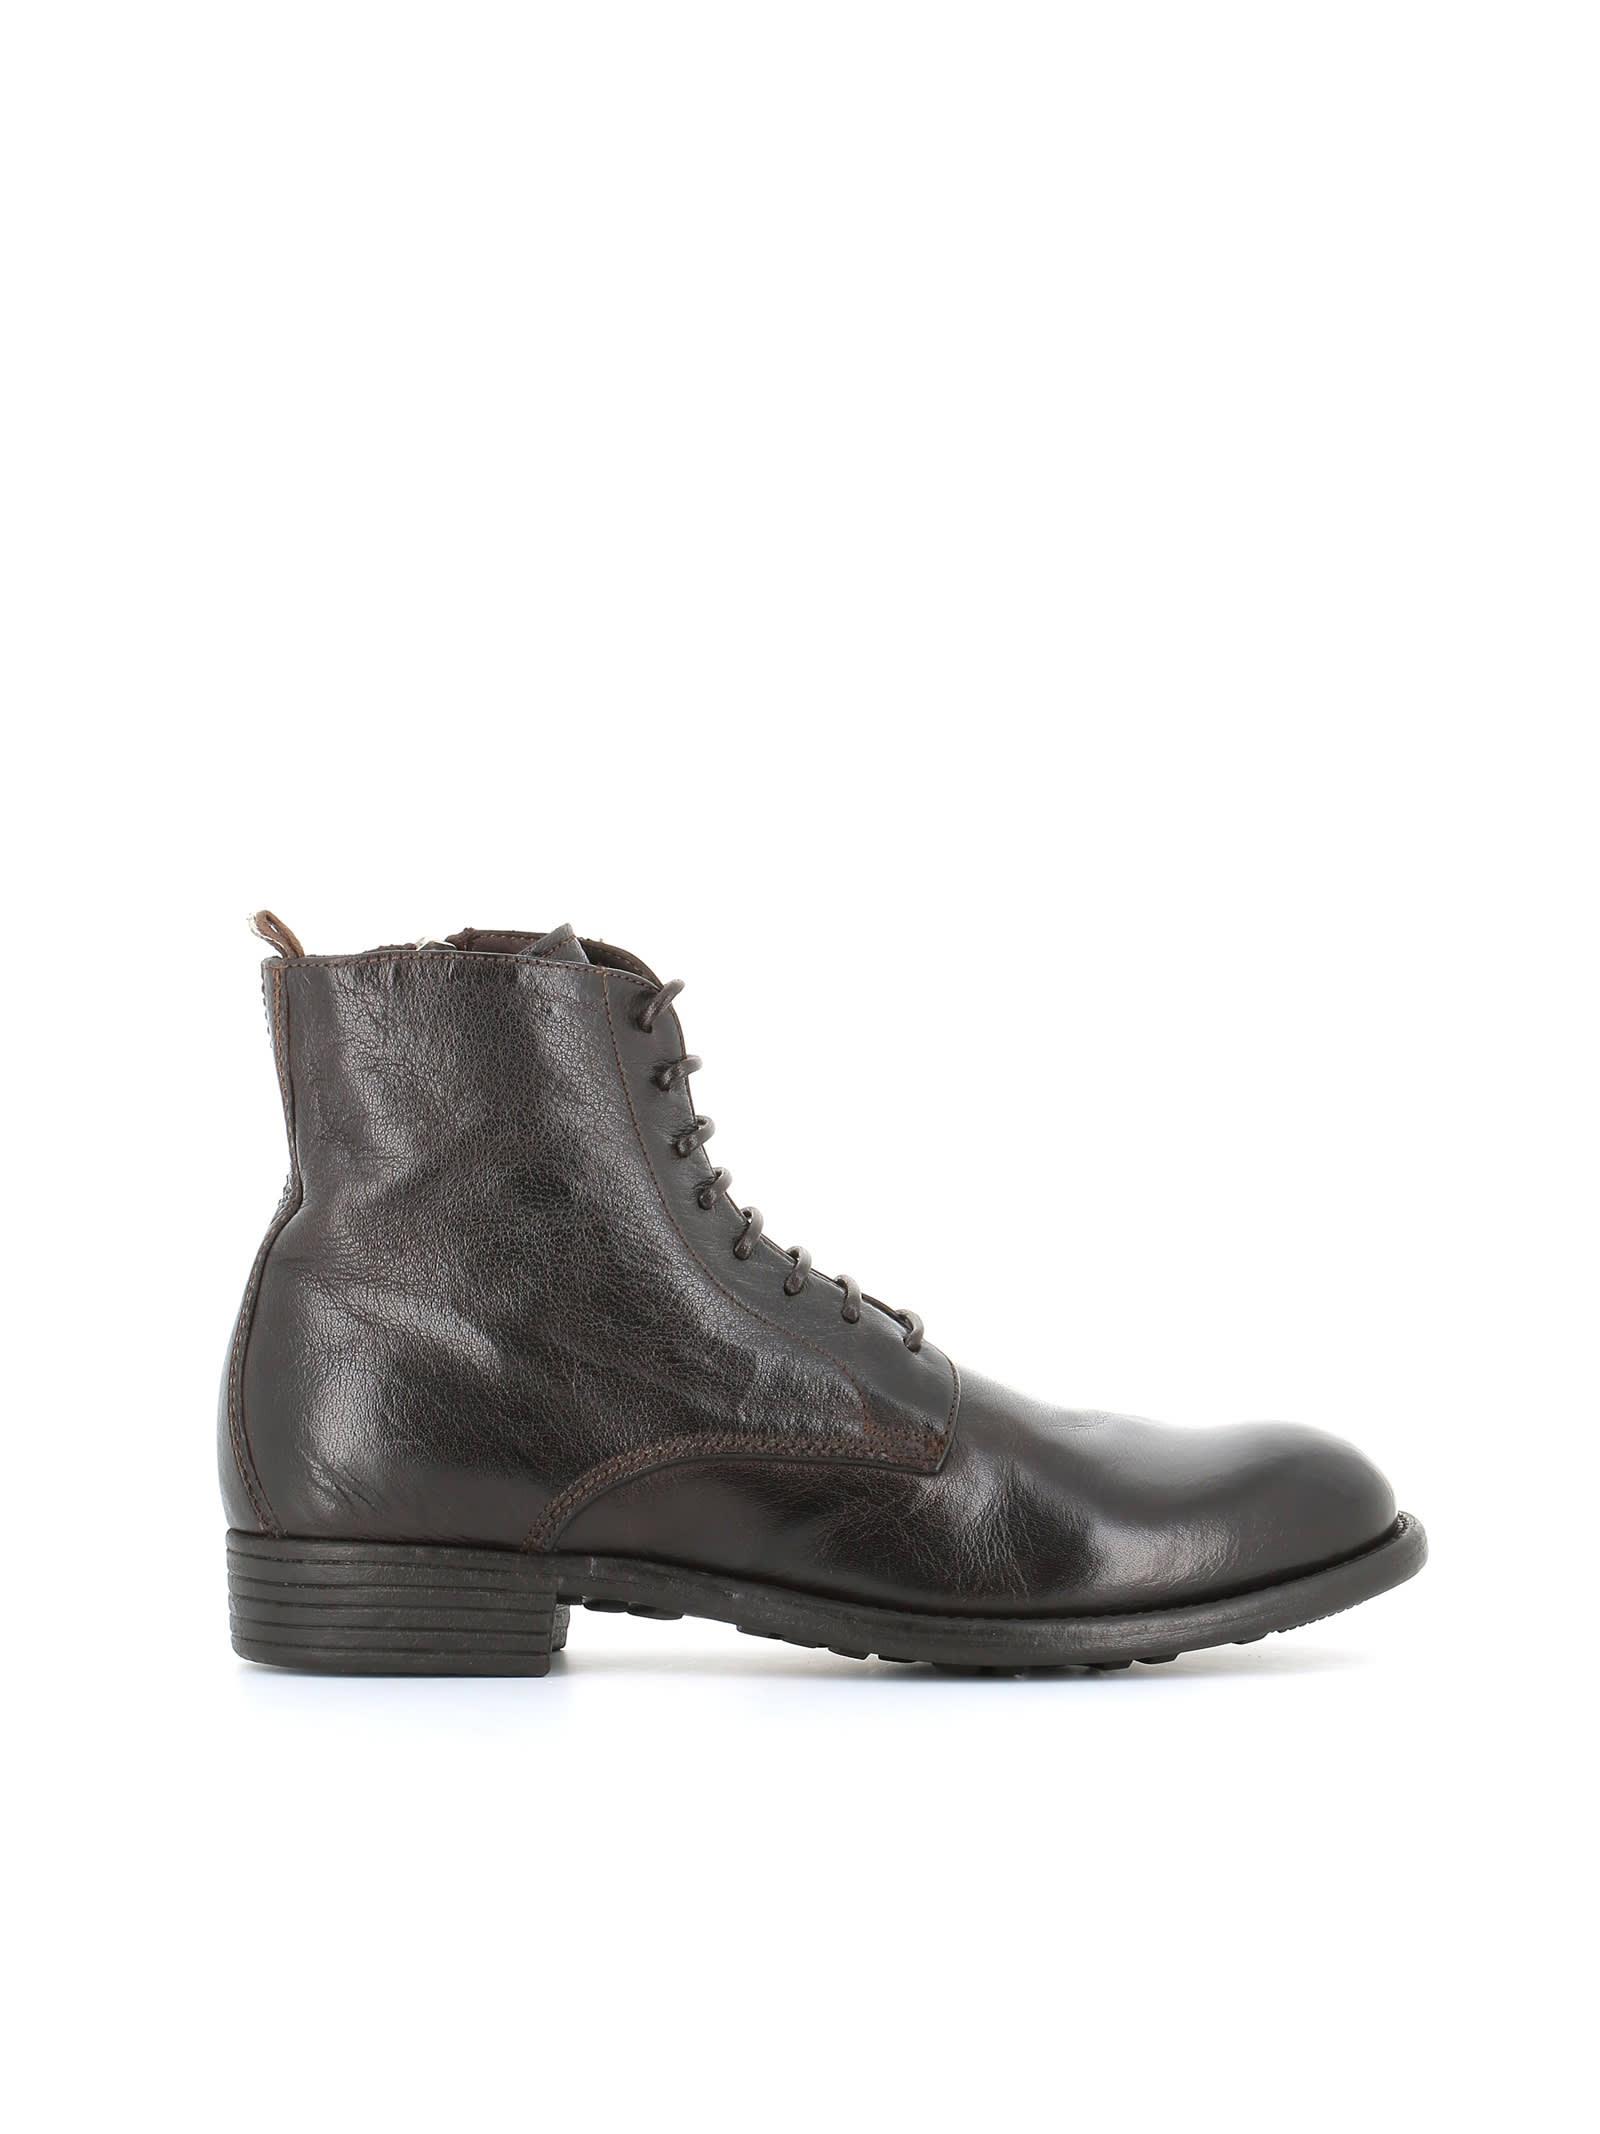 Officine Creative Shoes LACE-UP BOOT CALIXTE/002